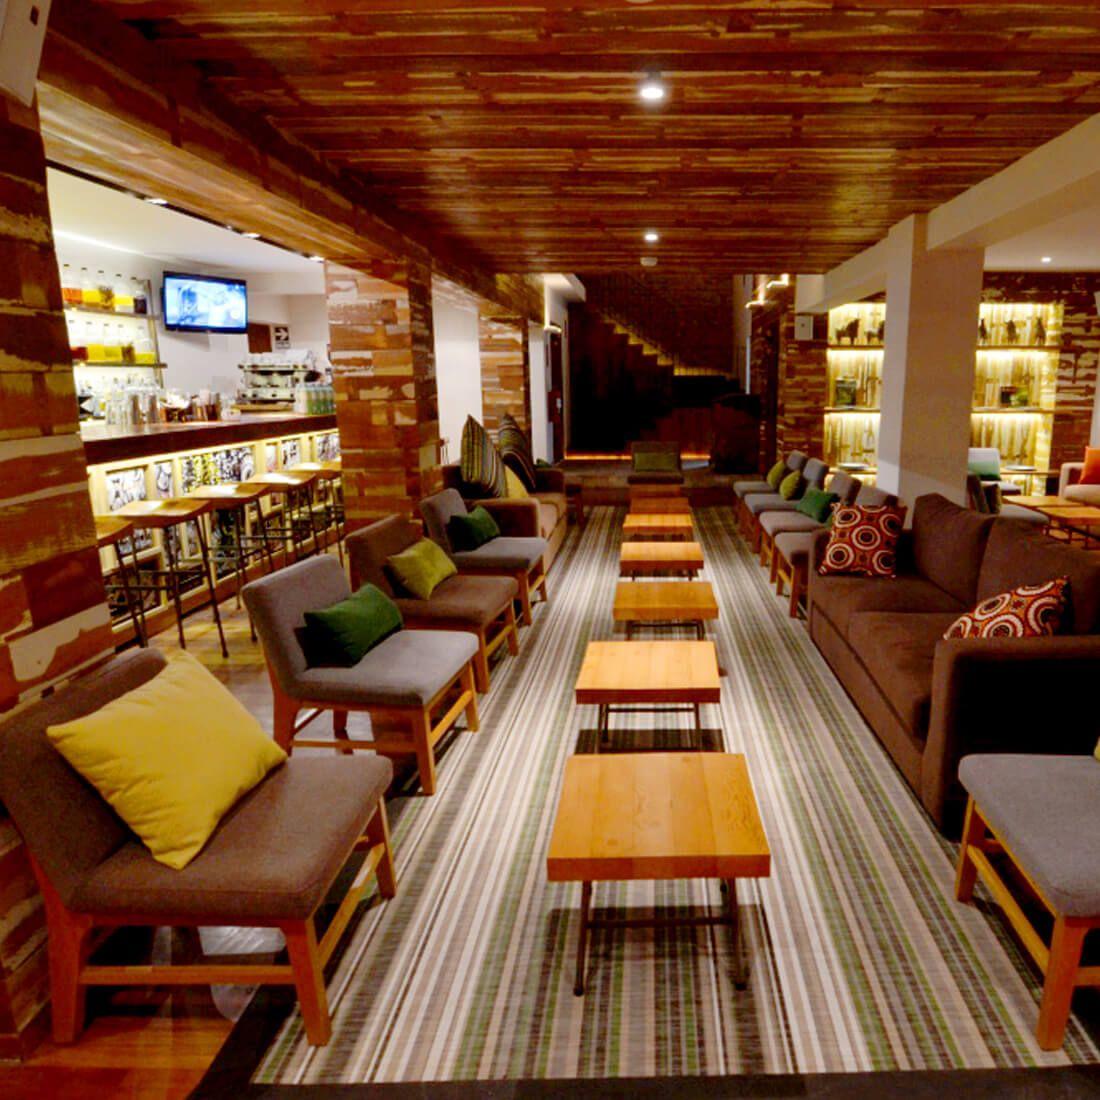 CALLE DEL MEDIO Restaurante - Reserva en restaurantes de Comida PERUANA - CRIOLLA - CUSCO - MESA 24/7 | CUSCO - Perú